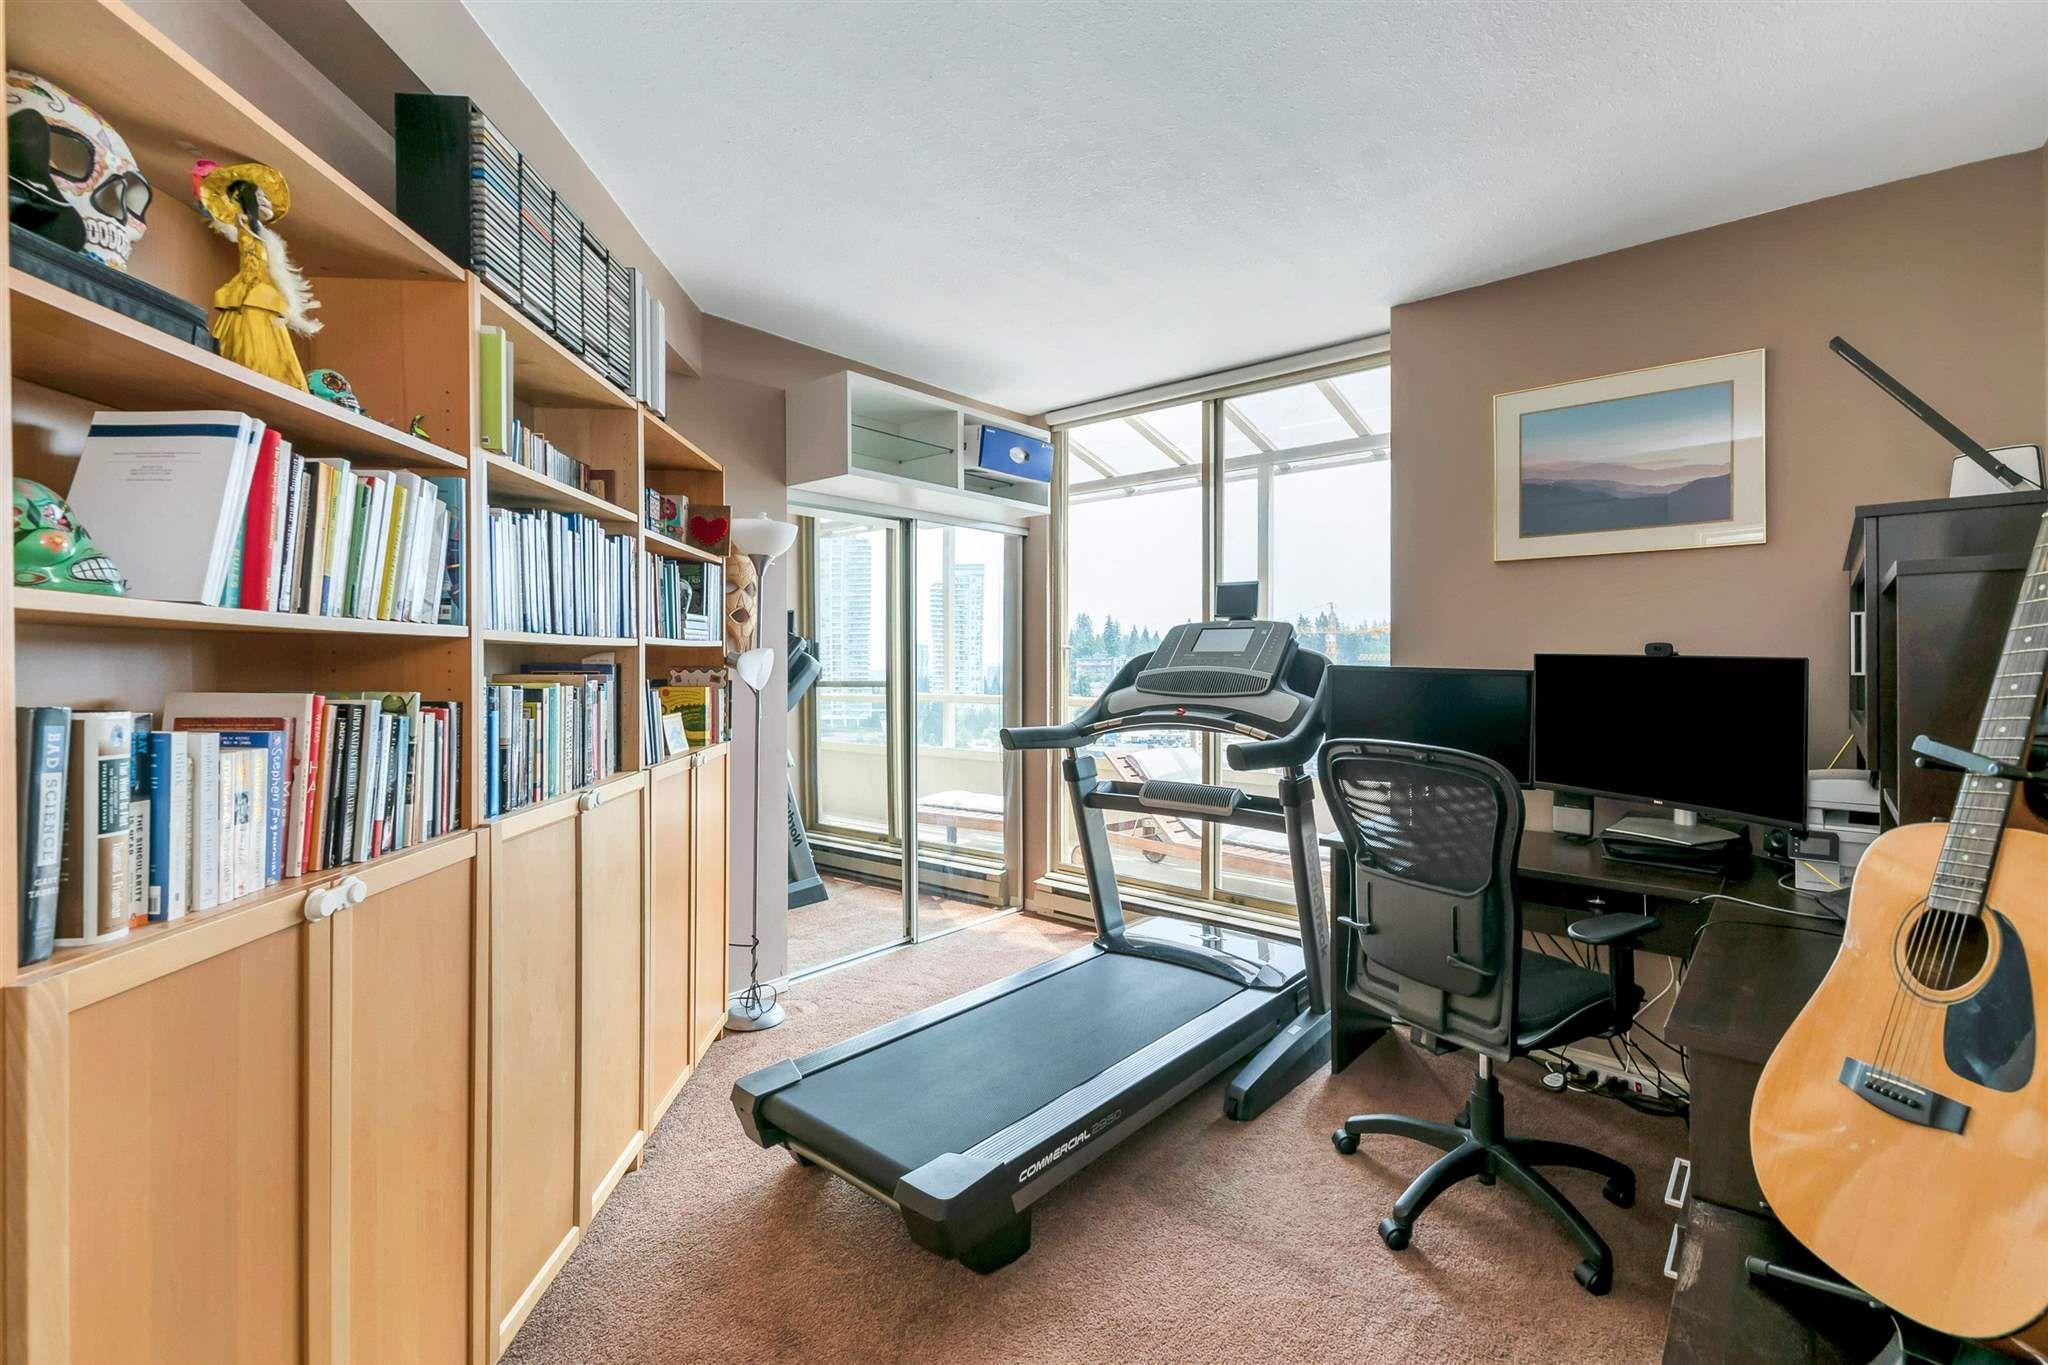 "Photo 24: Photos: 1401 728 FARROW Street in Coquitlam: Coquitlam West Condo for sale in ""THE VICTORIA"" : MLS®# R2615321"